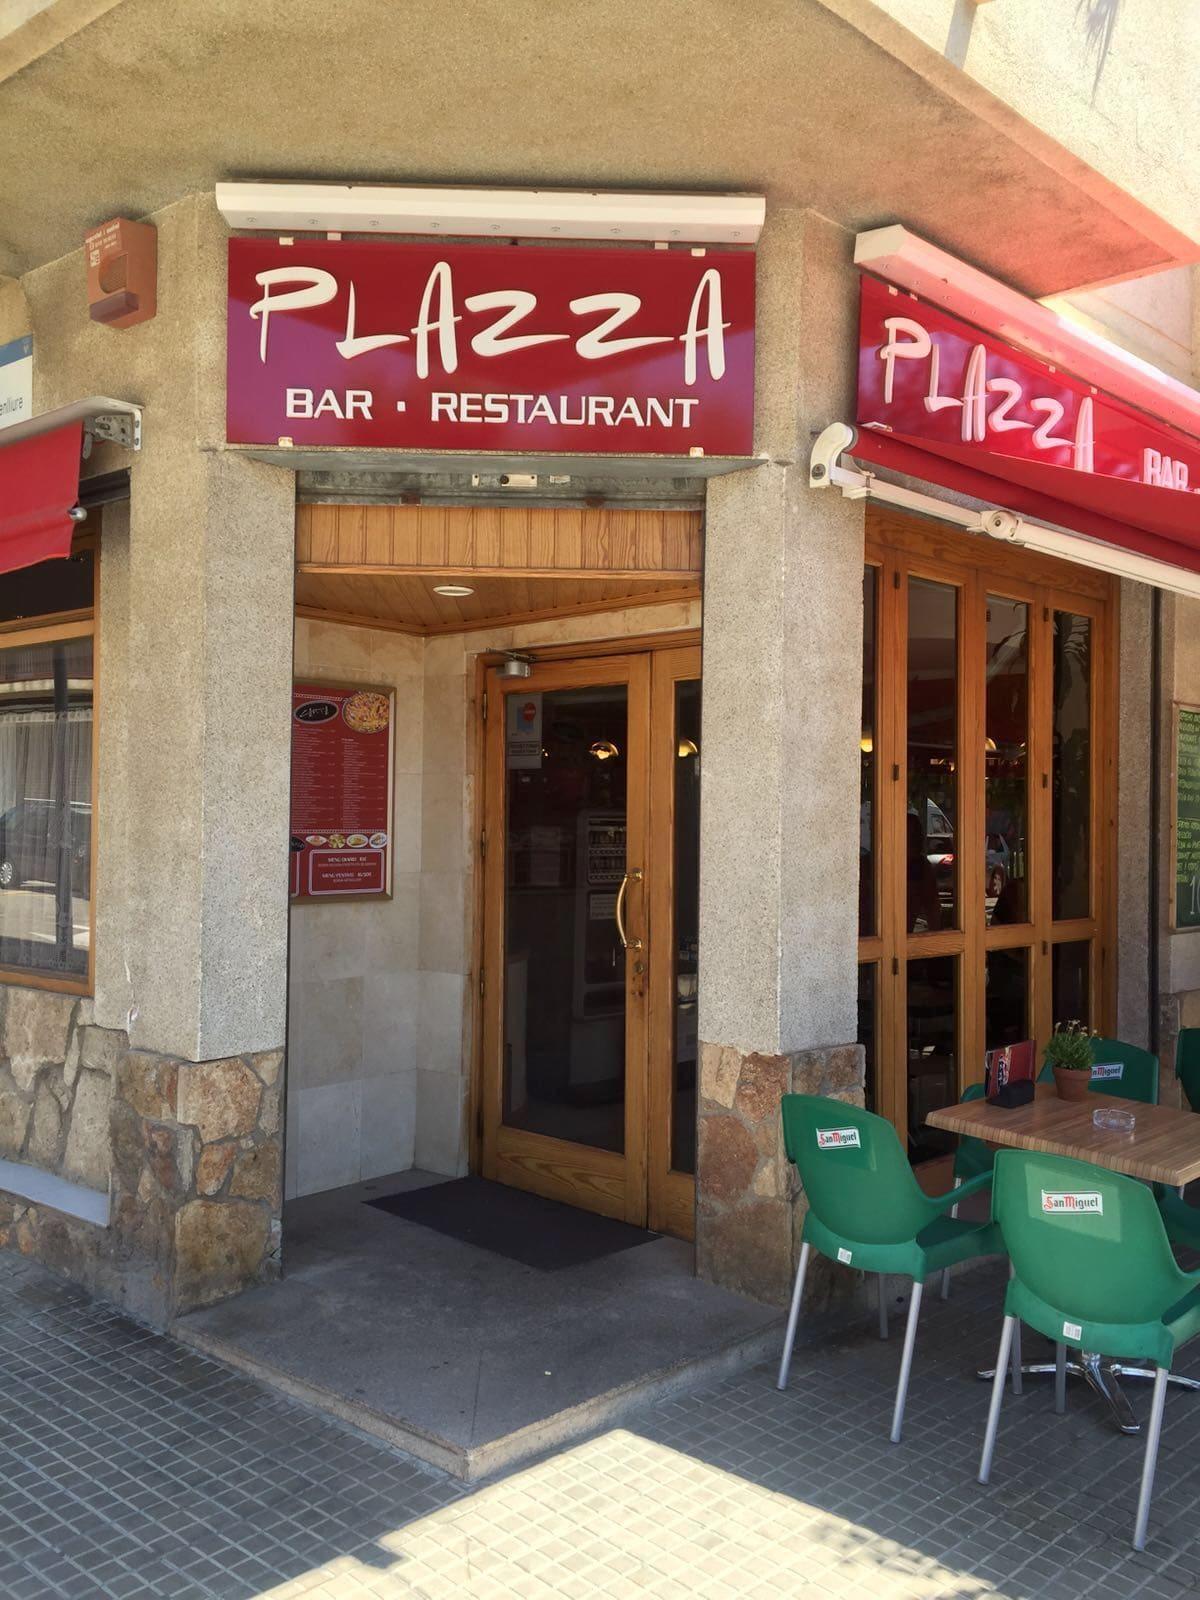 PLAZZA2 - PLAZZA2